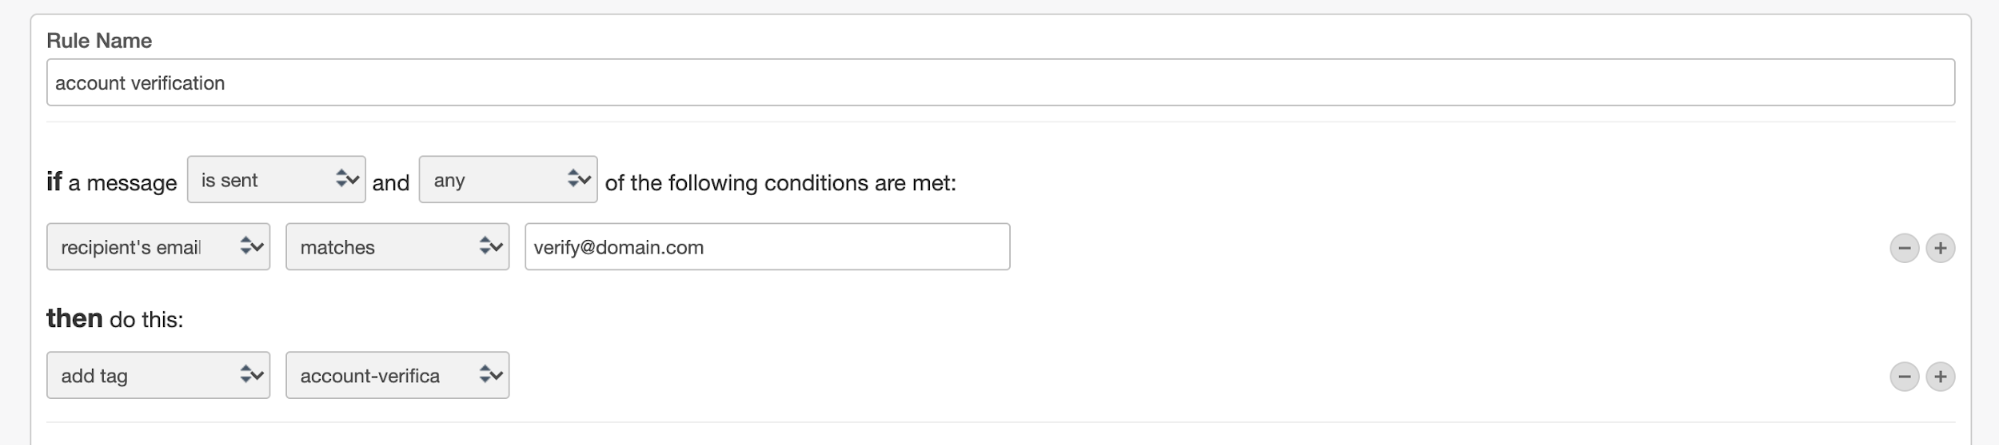 Screenshot of adding an account verification via Transactional Email